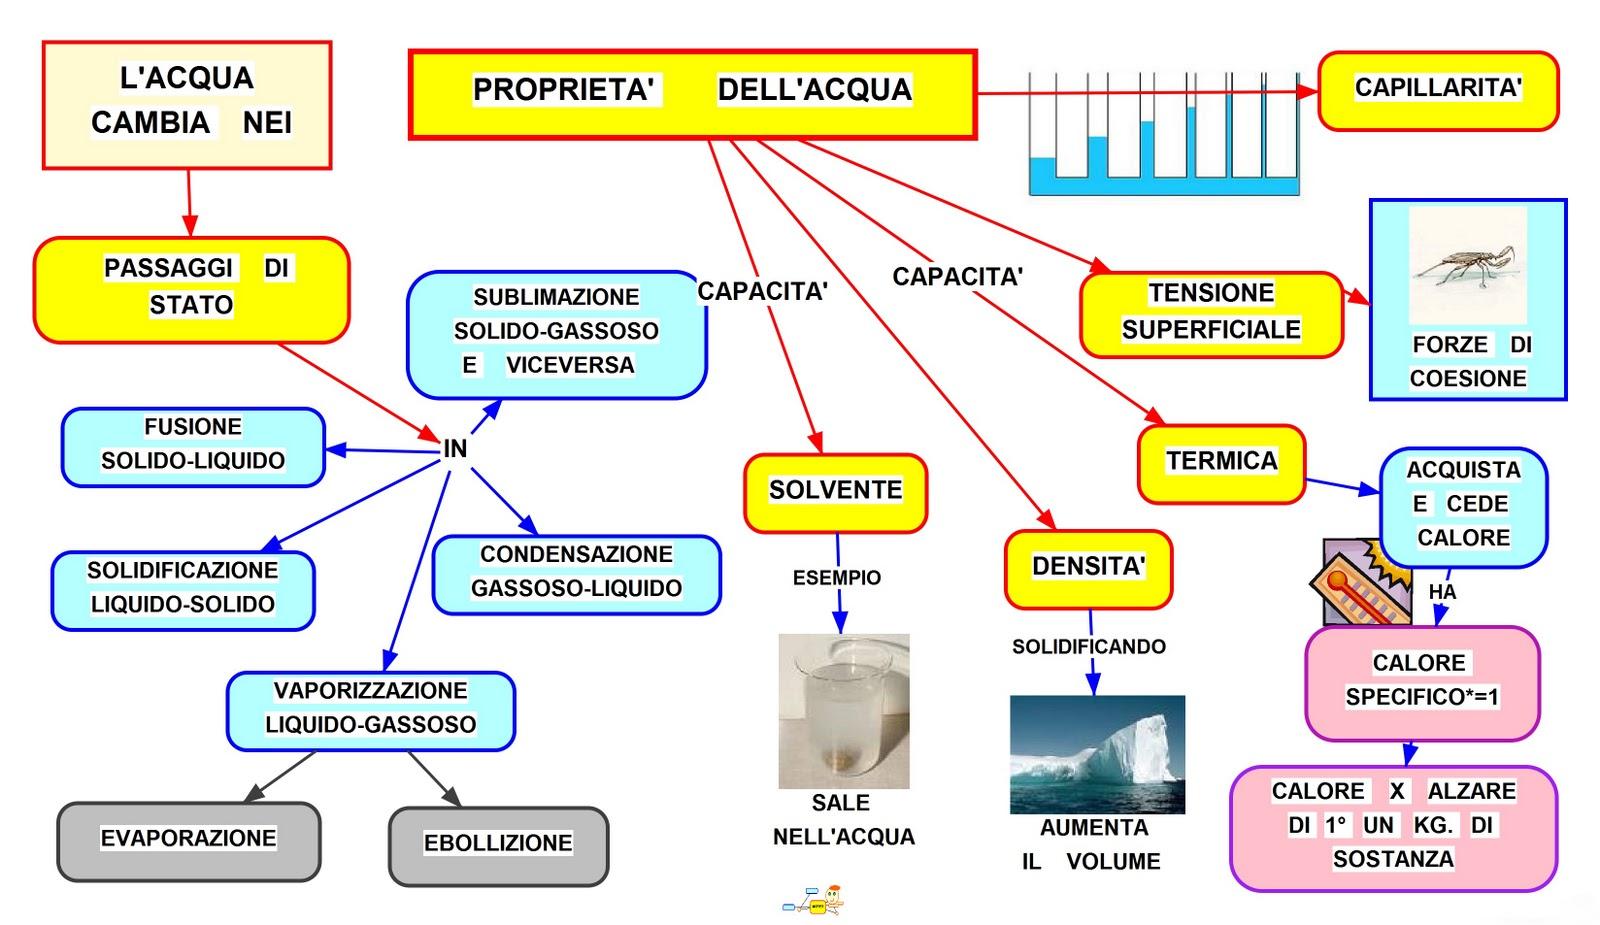 All Categories Livinzilla Regen Golf Cart 36 Volt Ezgo Dc S Wiring Diagram Biologia Delle Piante Zanichelli Pdf To Word